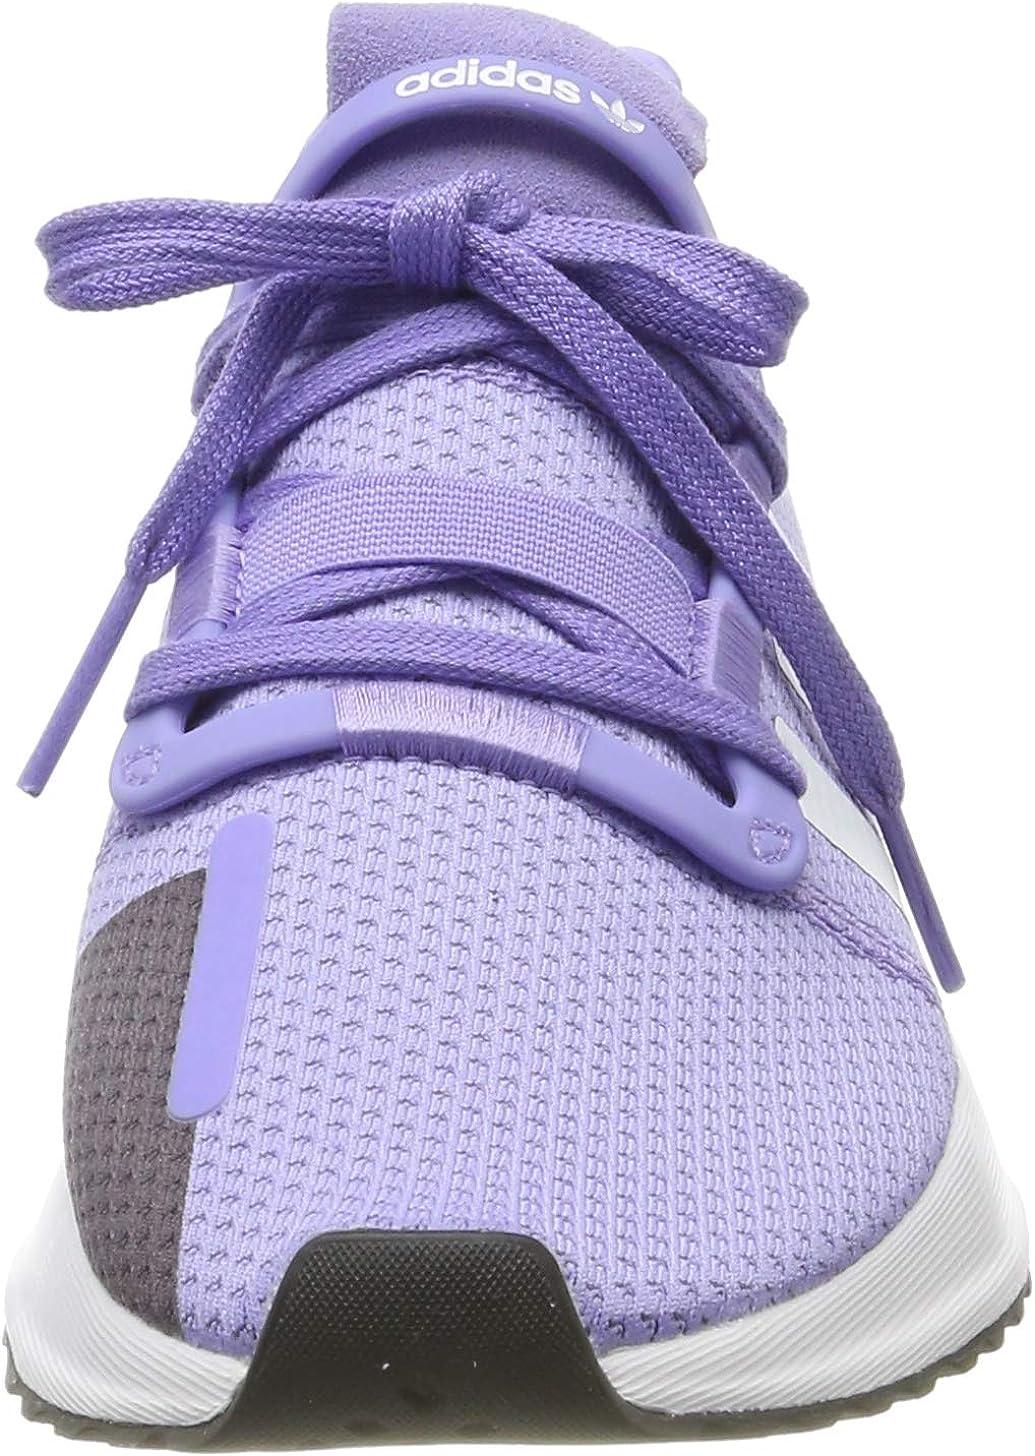 Details zu adidas U PATH Run J W Schuhe Damen Erwachsene